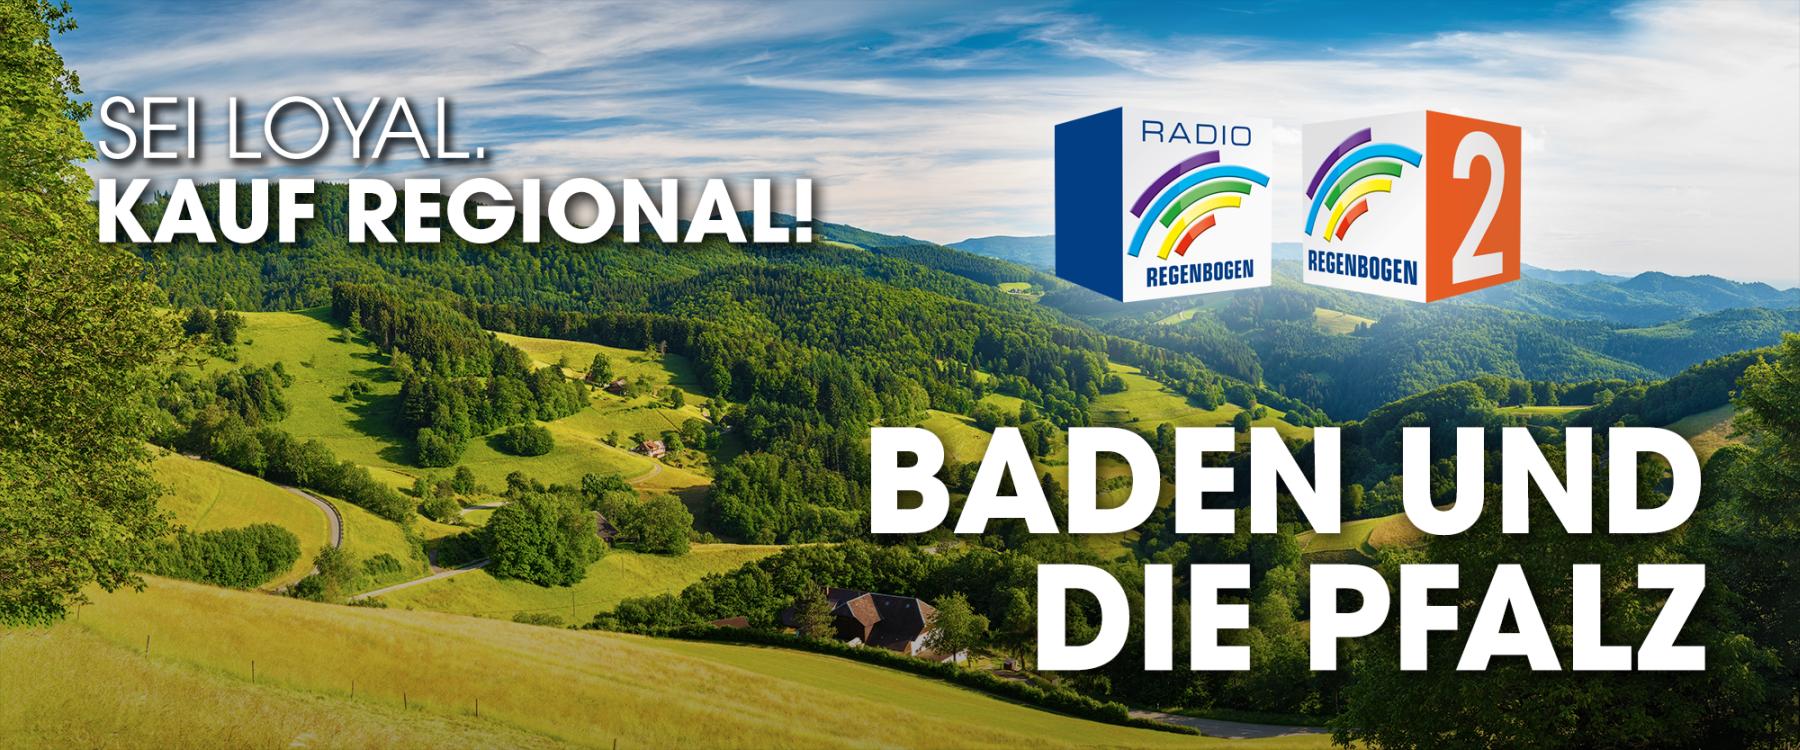 Kauf-regional-Titel-BadenPfalz.png